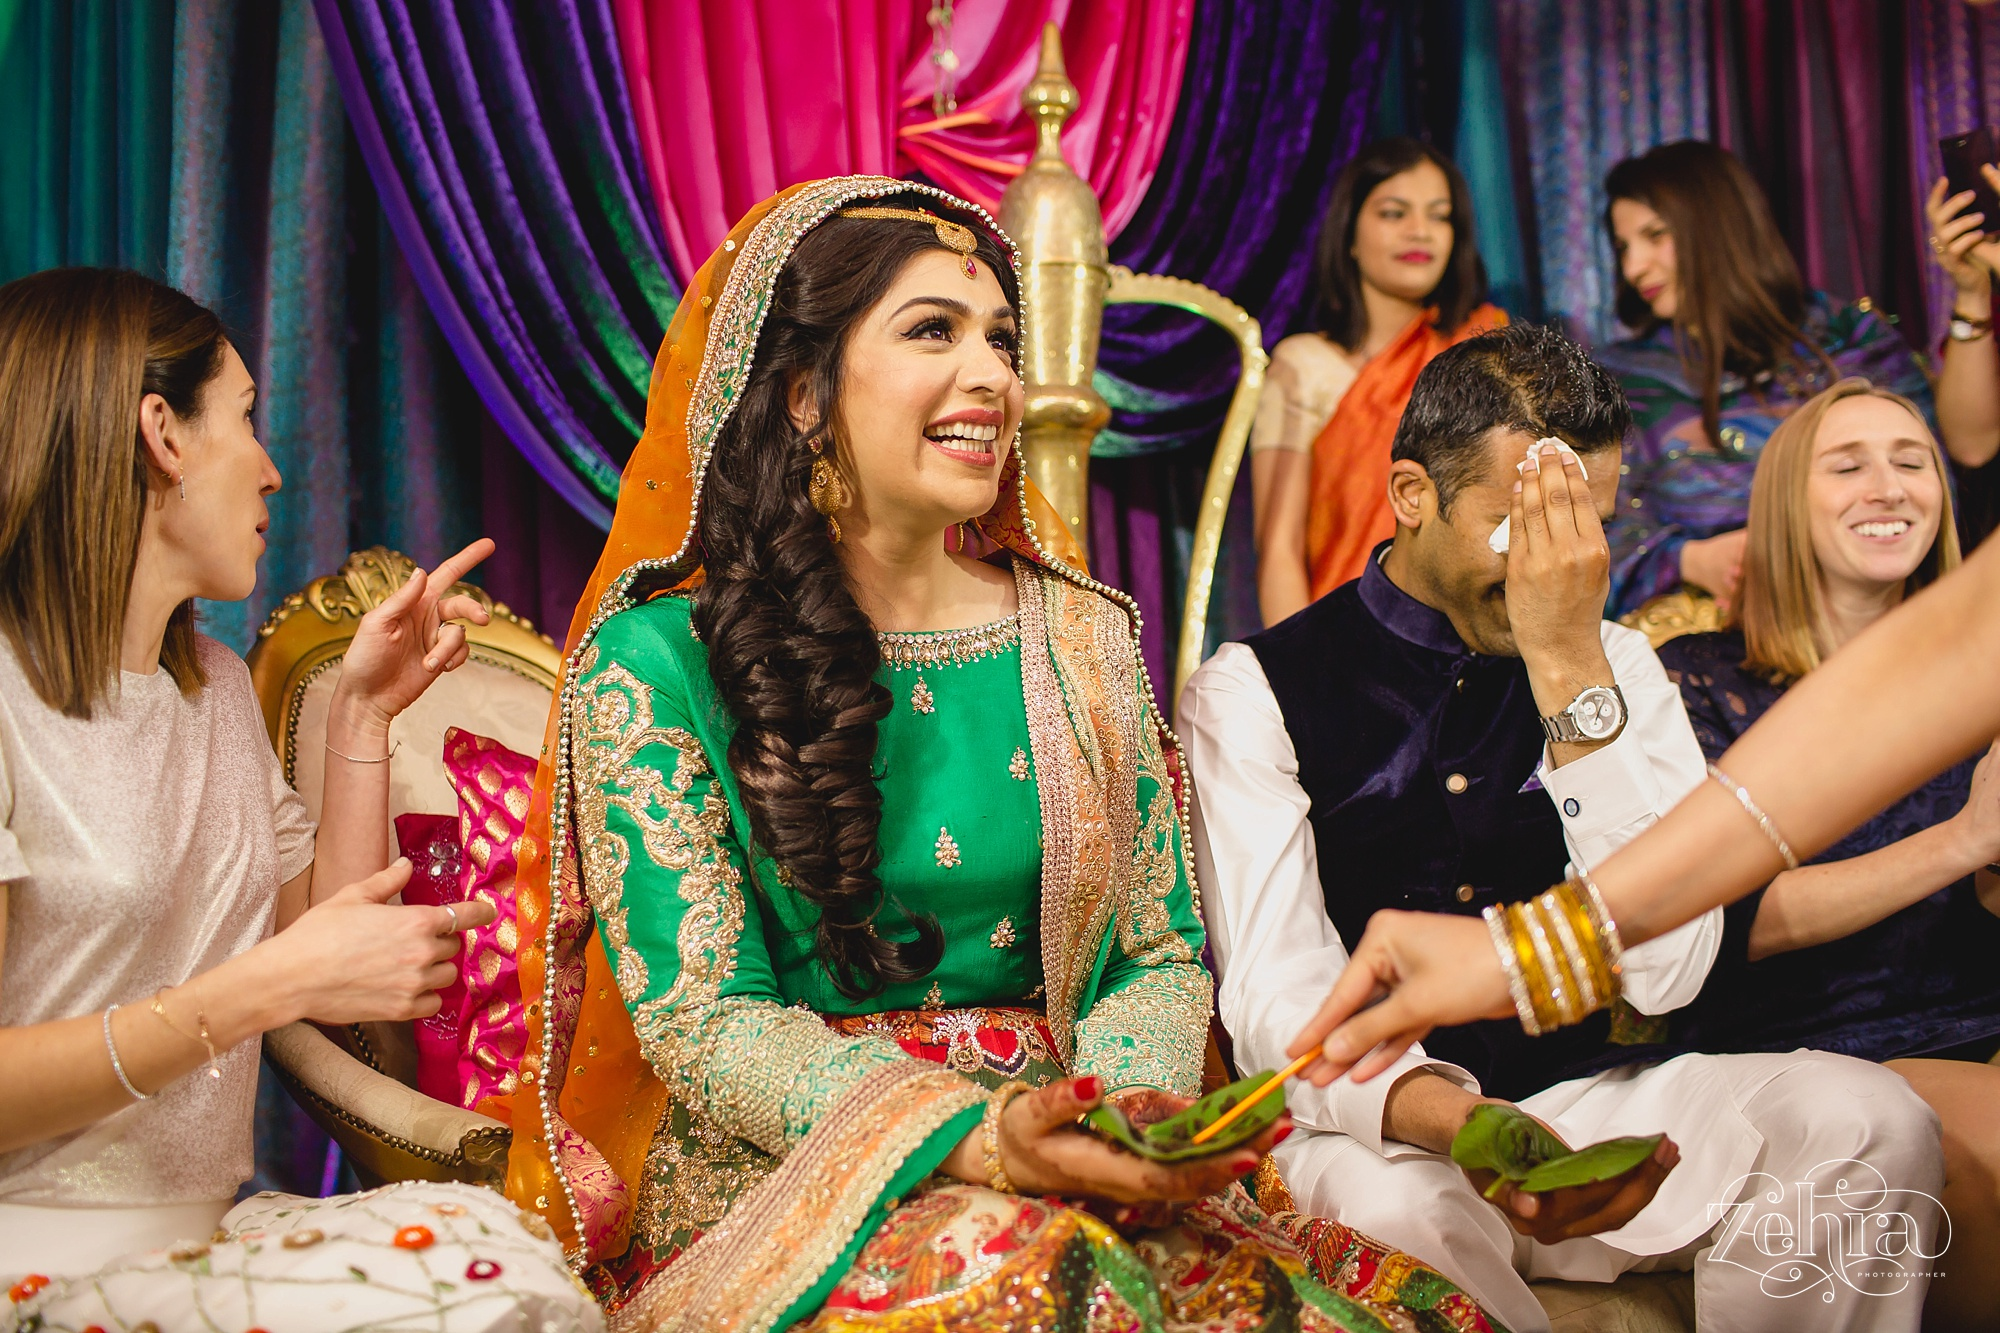 zehra wedding photographer arley hall cheshire035.jpg